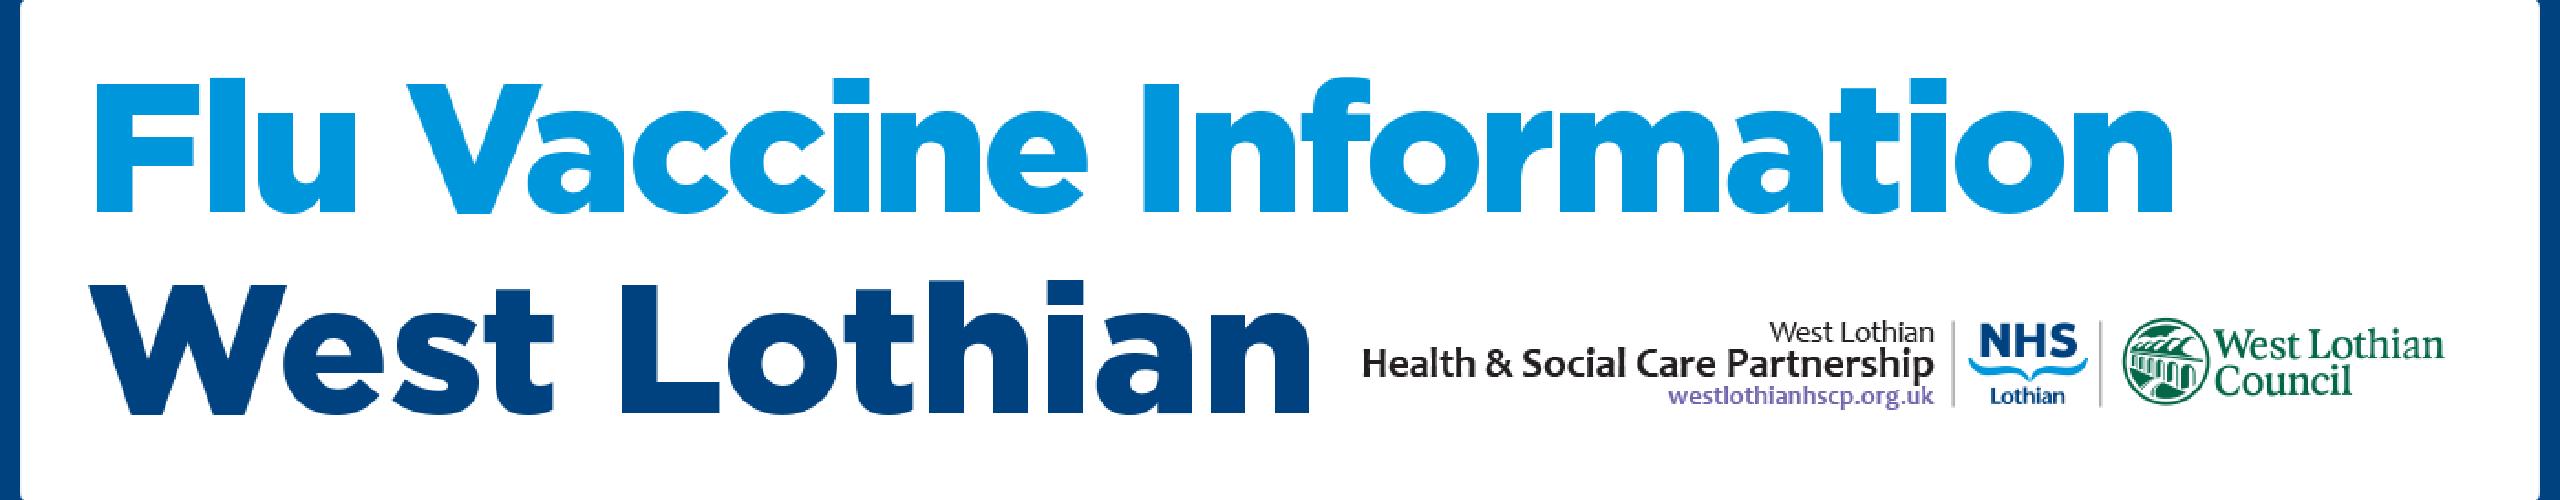 Flu Vaccine Information West Lothian